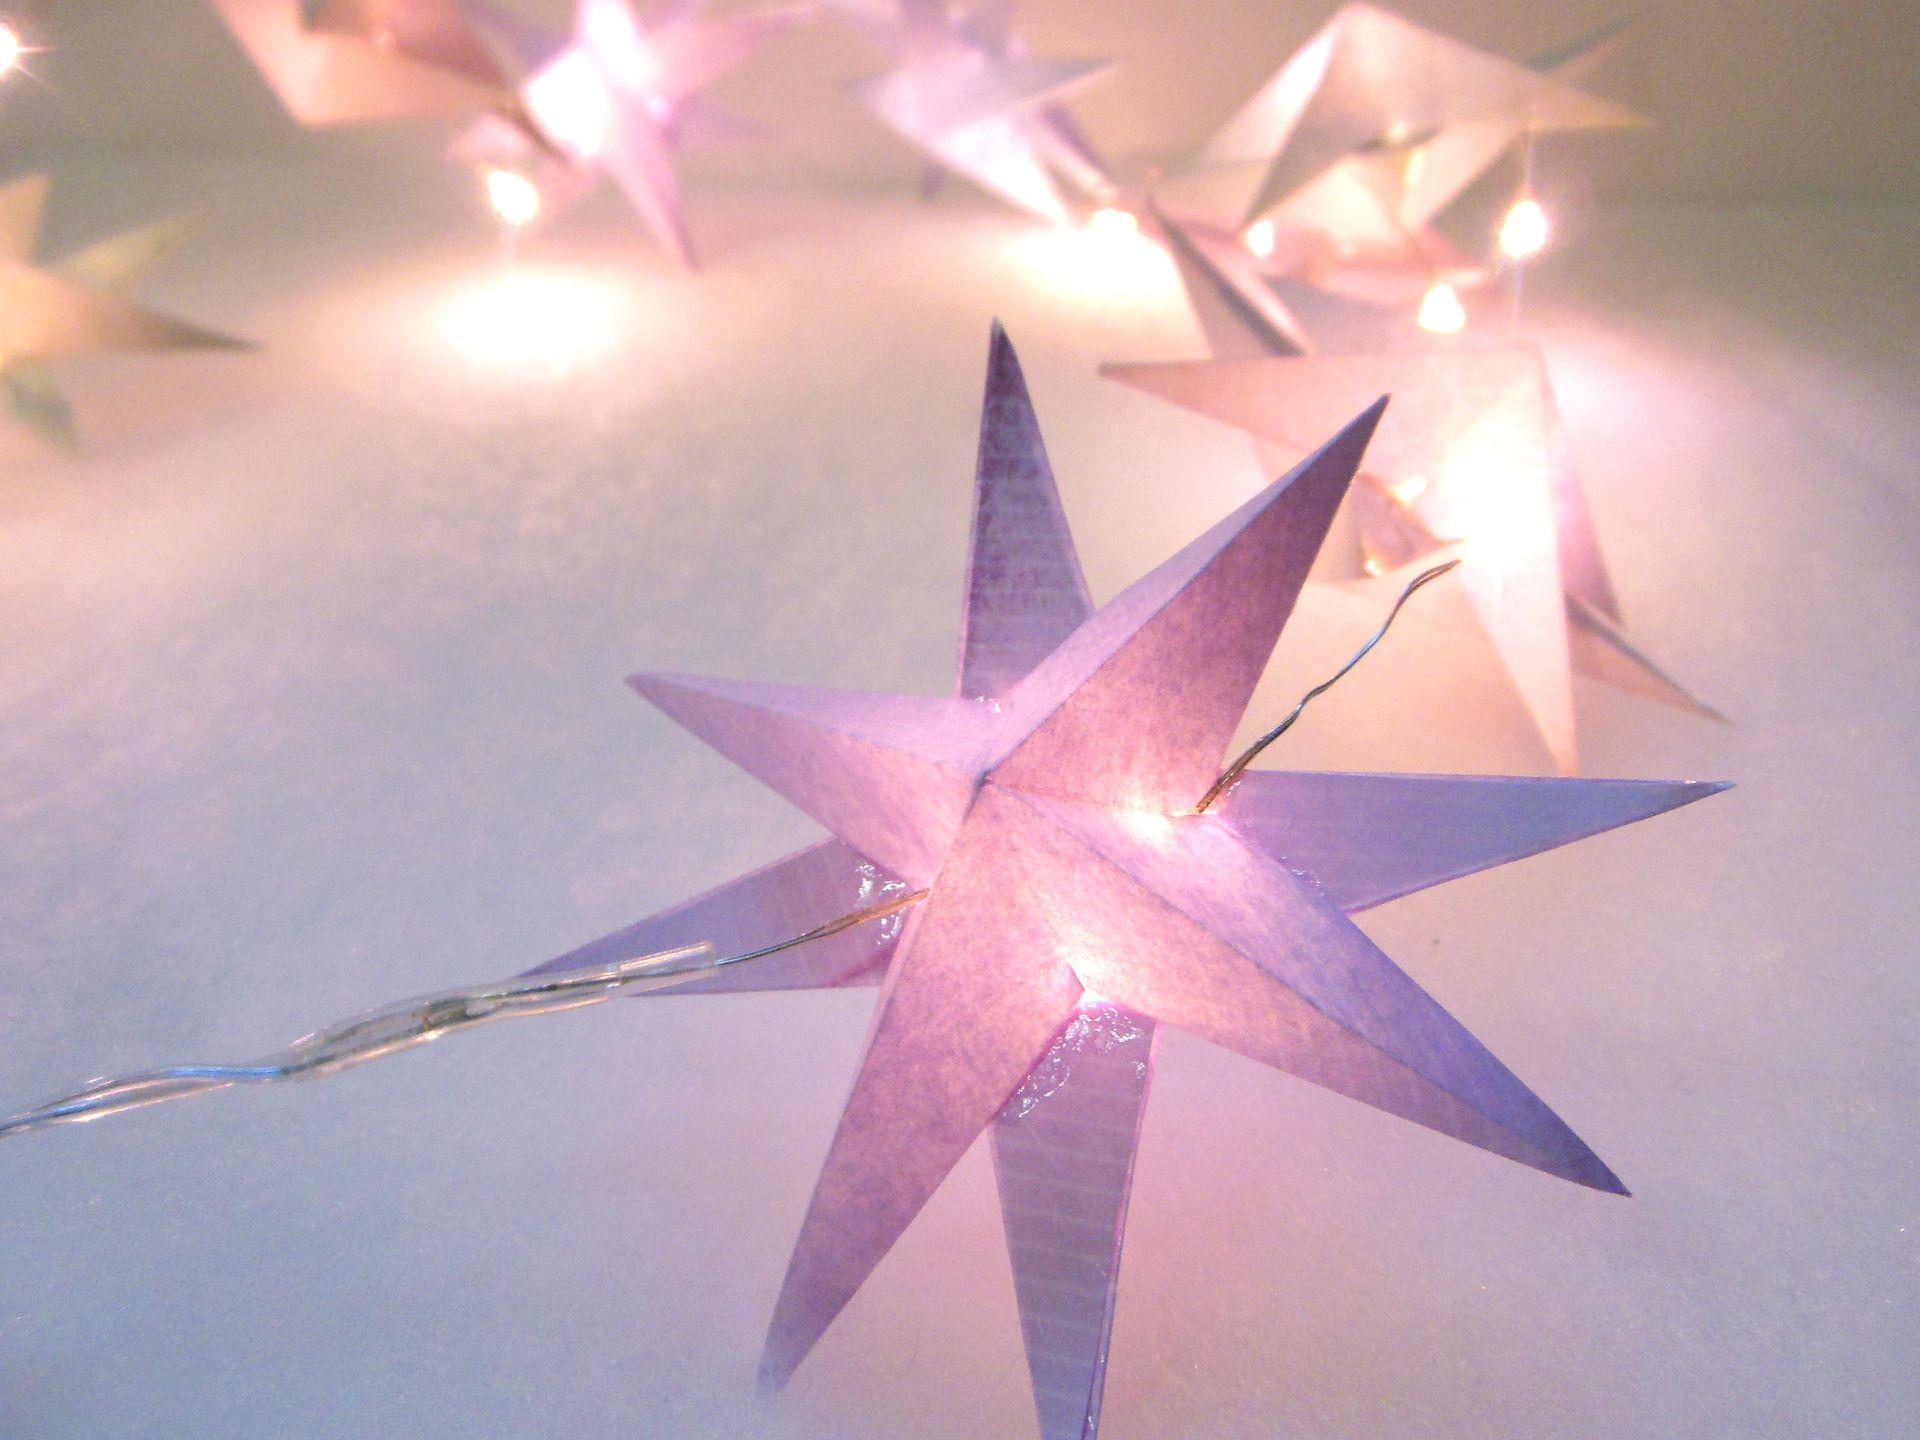 guirlande d étoiles origami guirlande lumineuse 20 leds 10 étoiles